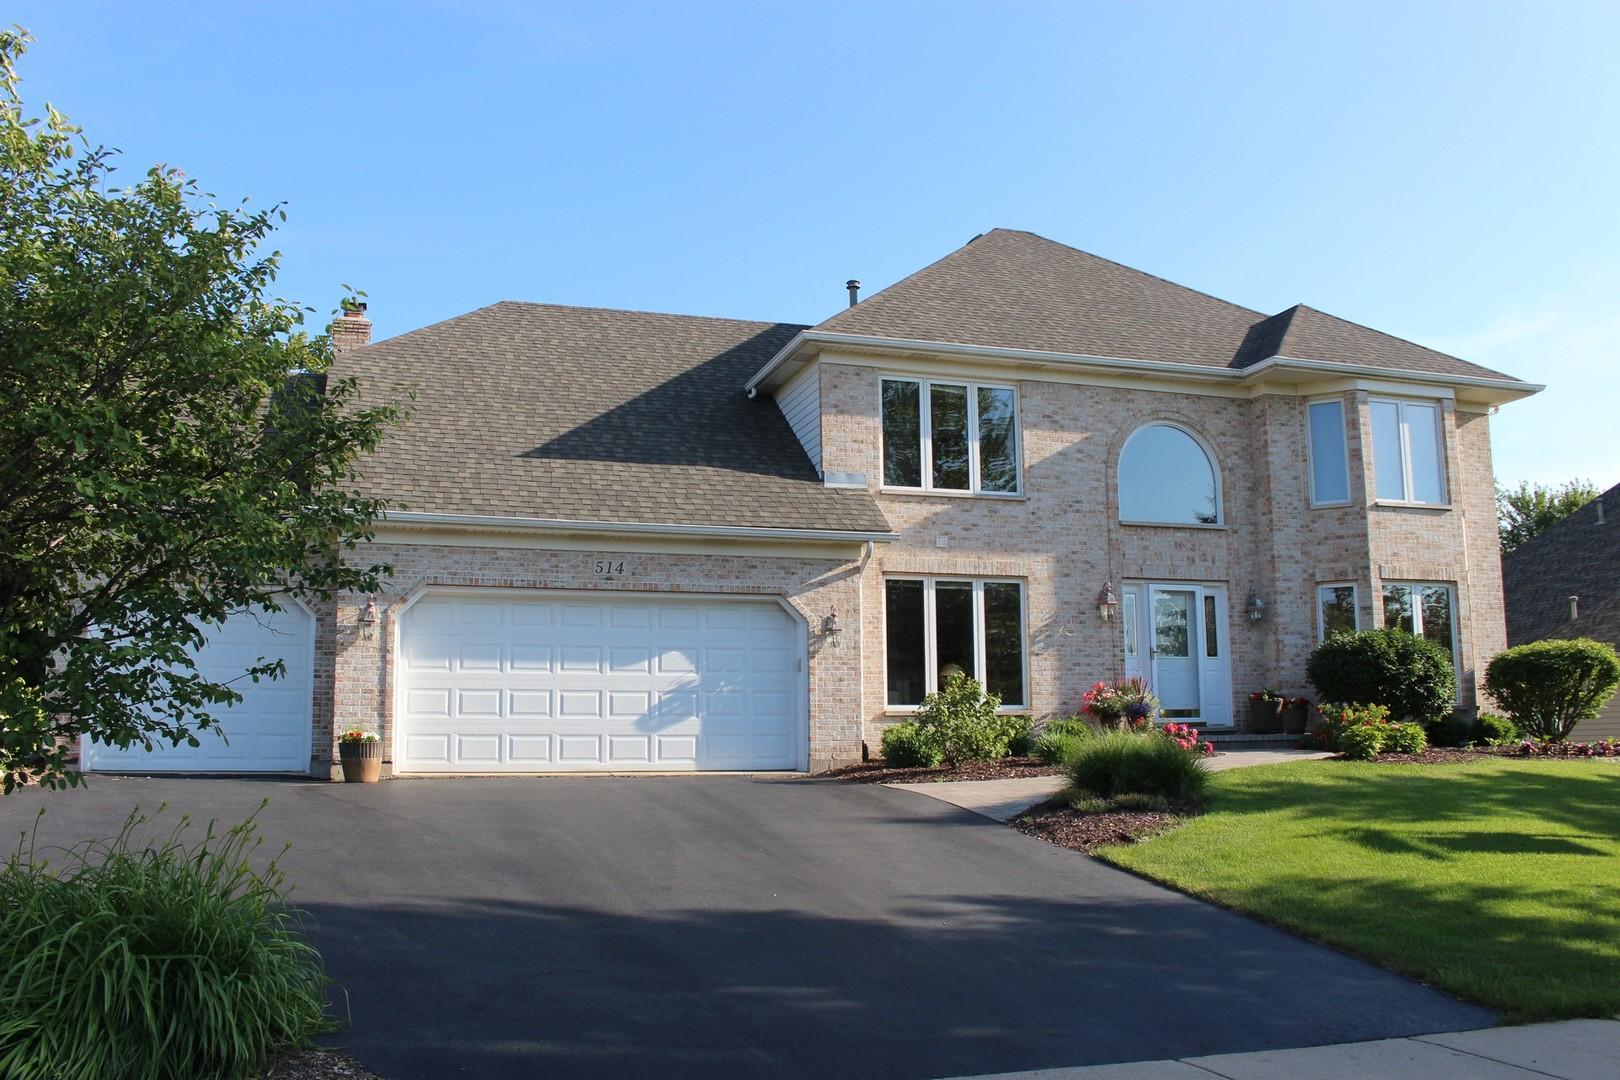 514 POTTAWATOMIE Trail, Batavia in Kane County, IL 60510 Home for Sale